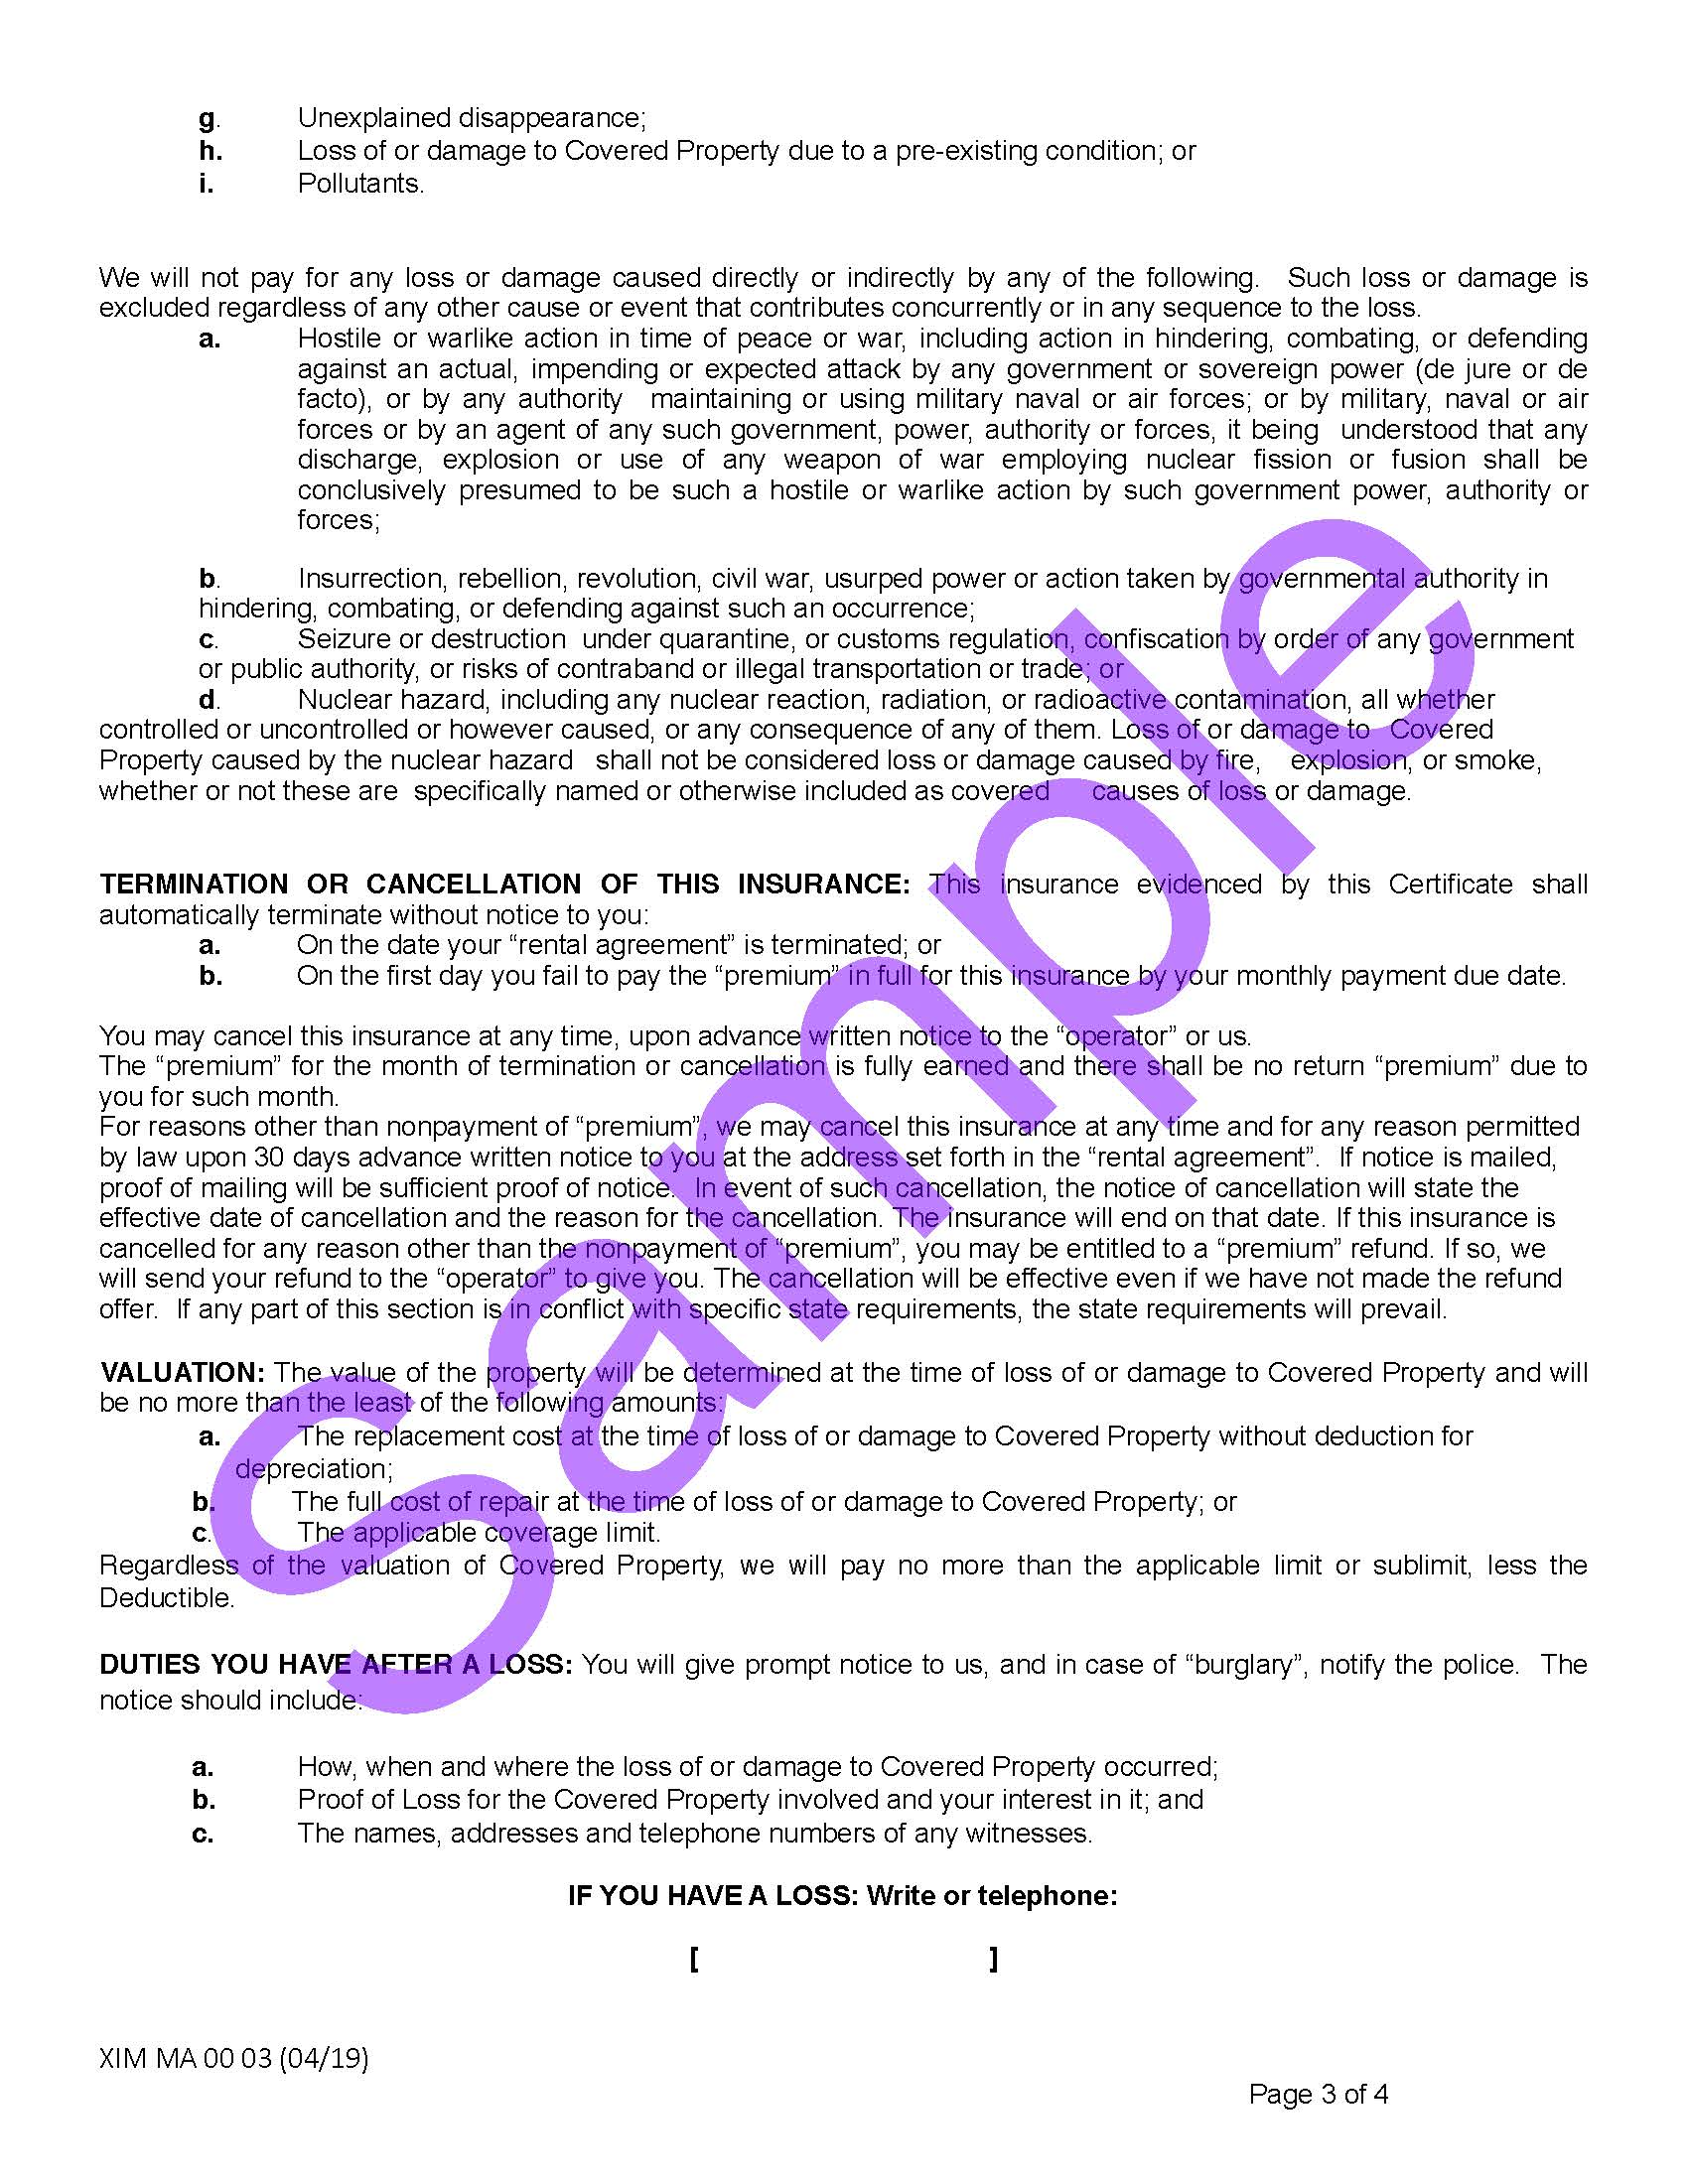 XIM MA 00 03 04 19 Massachusetts Certificate of Storage InsuranceSample_Page_3.jpg